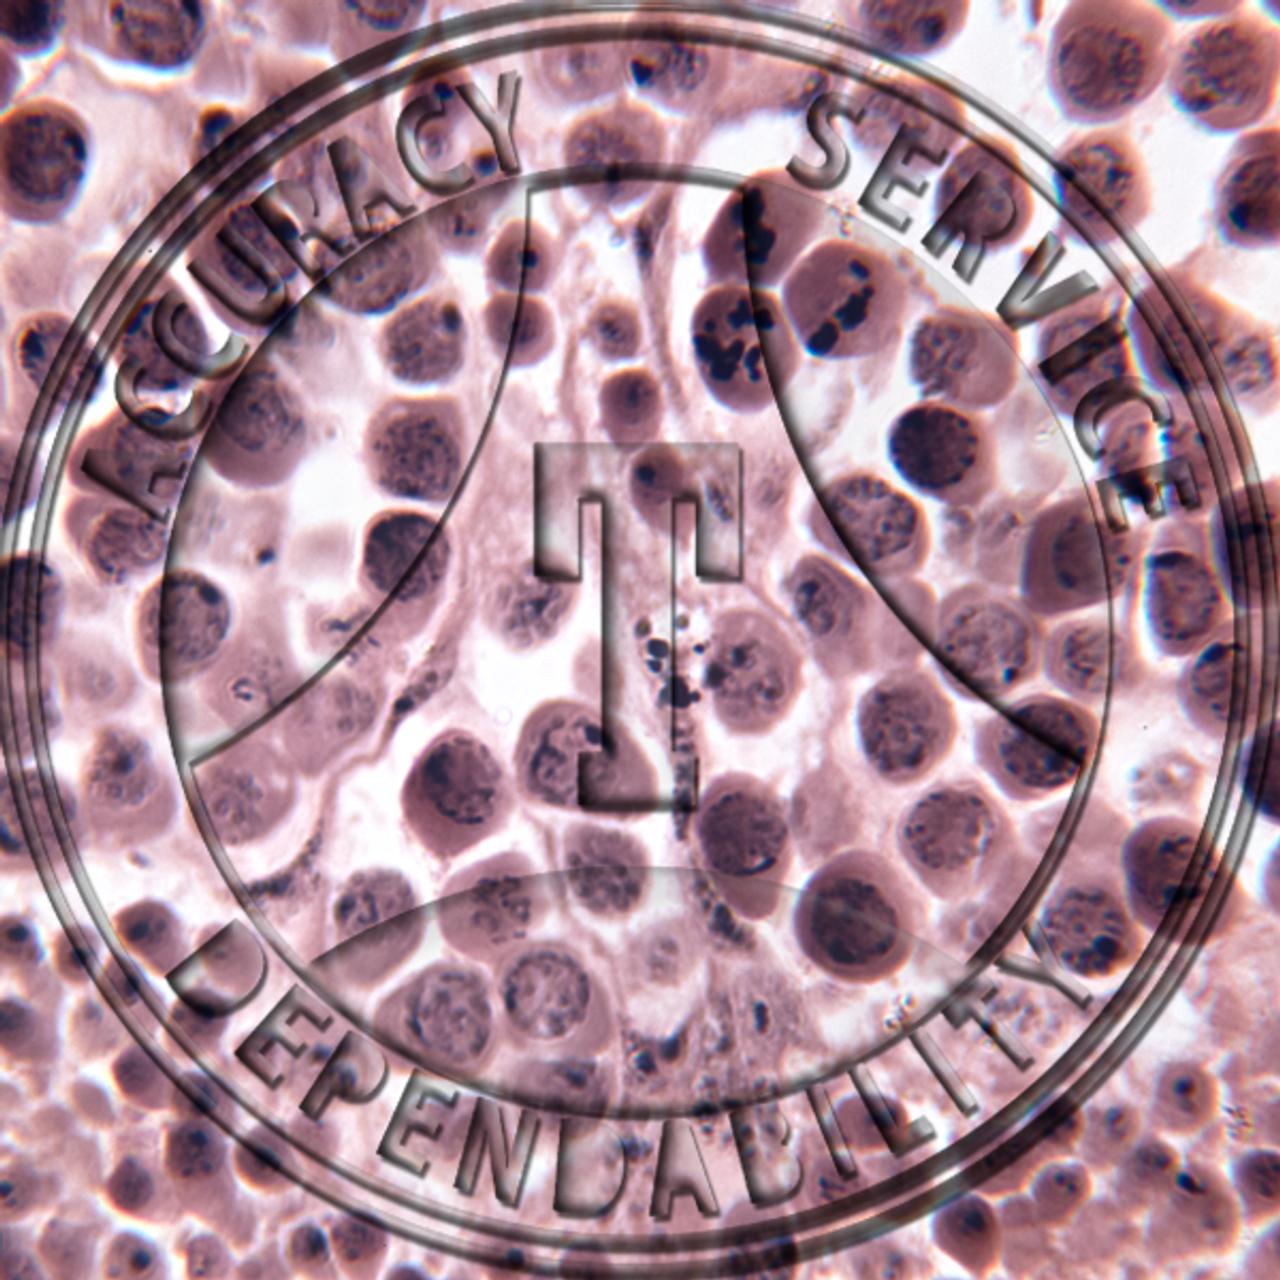 PMS43.30 - Grasshopper testis, TS, haematoxylin stain, showing animal meiosis